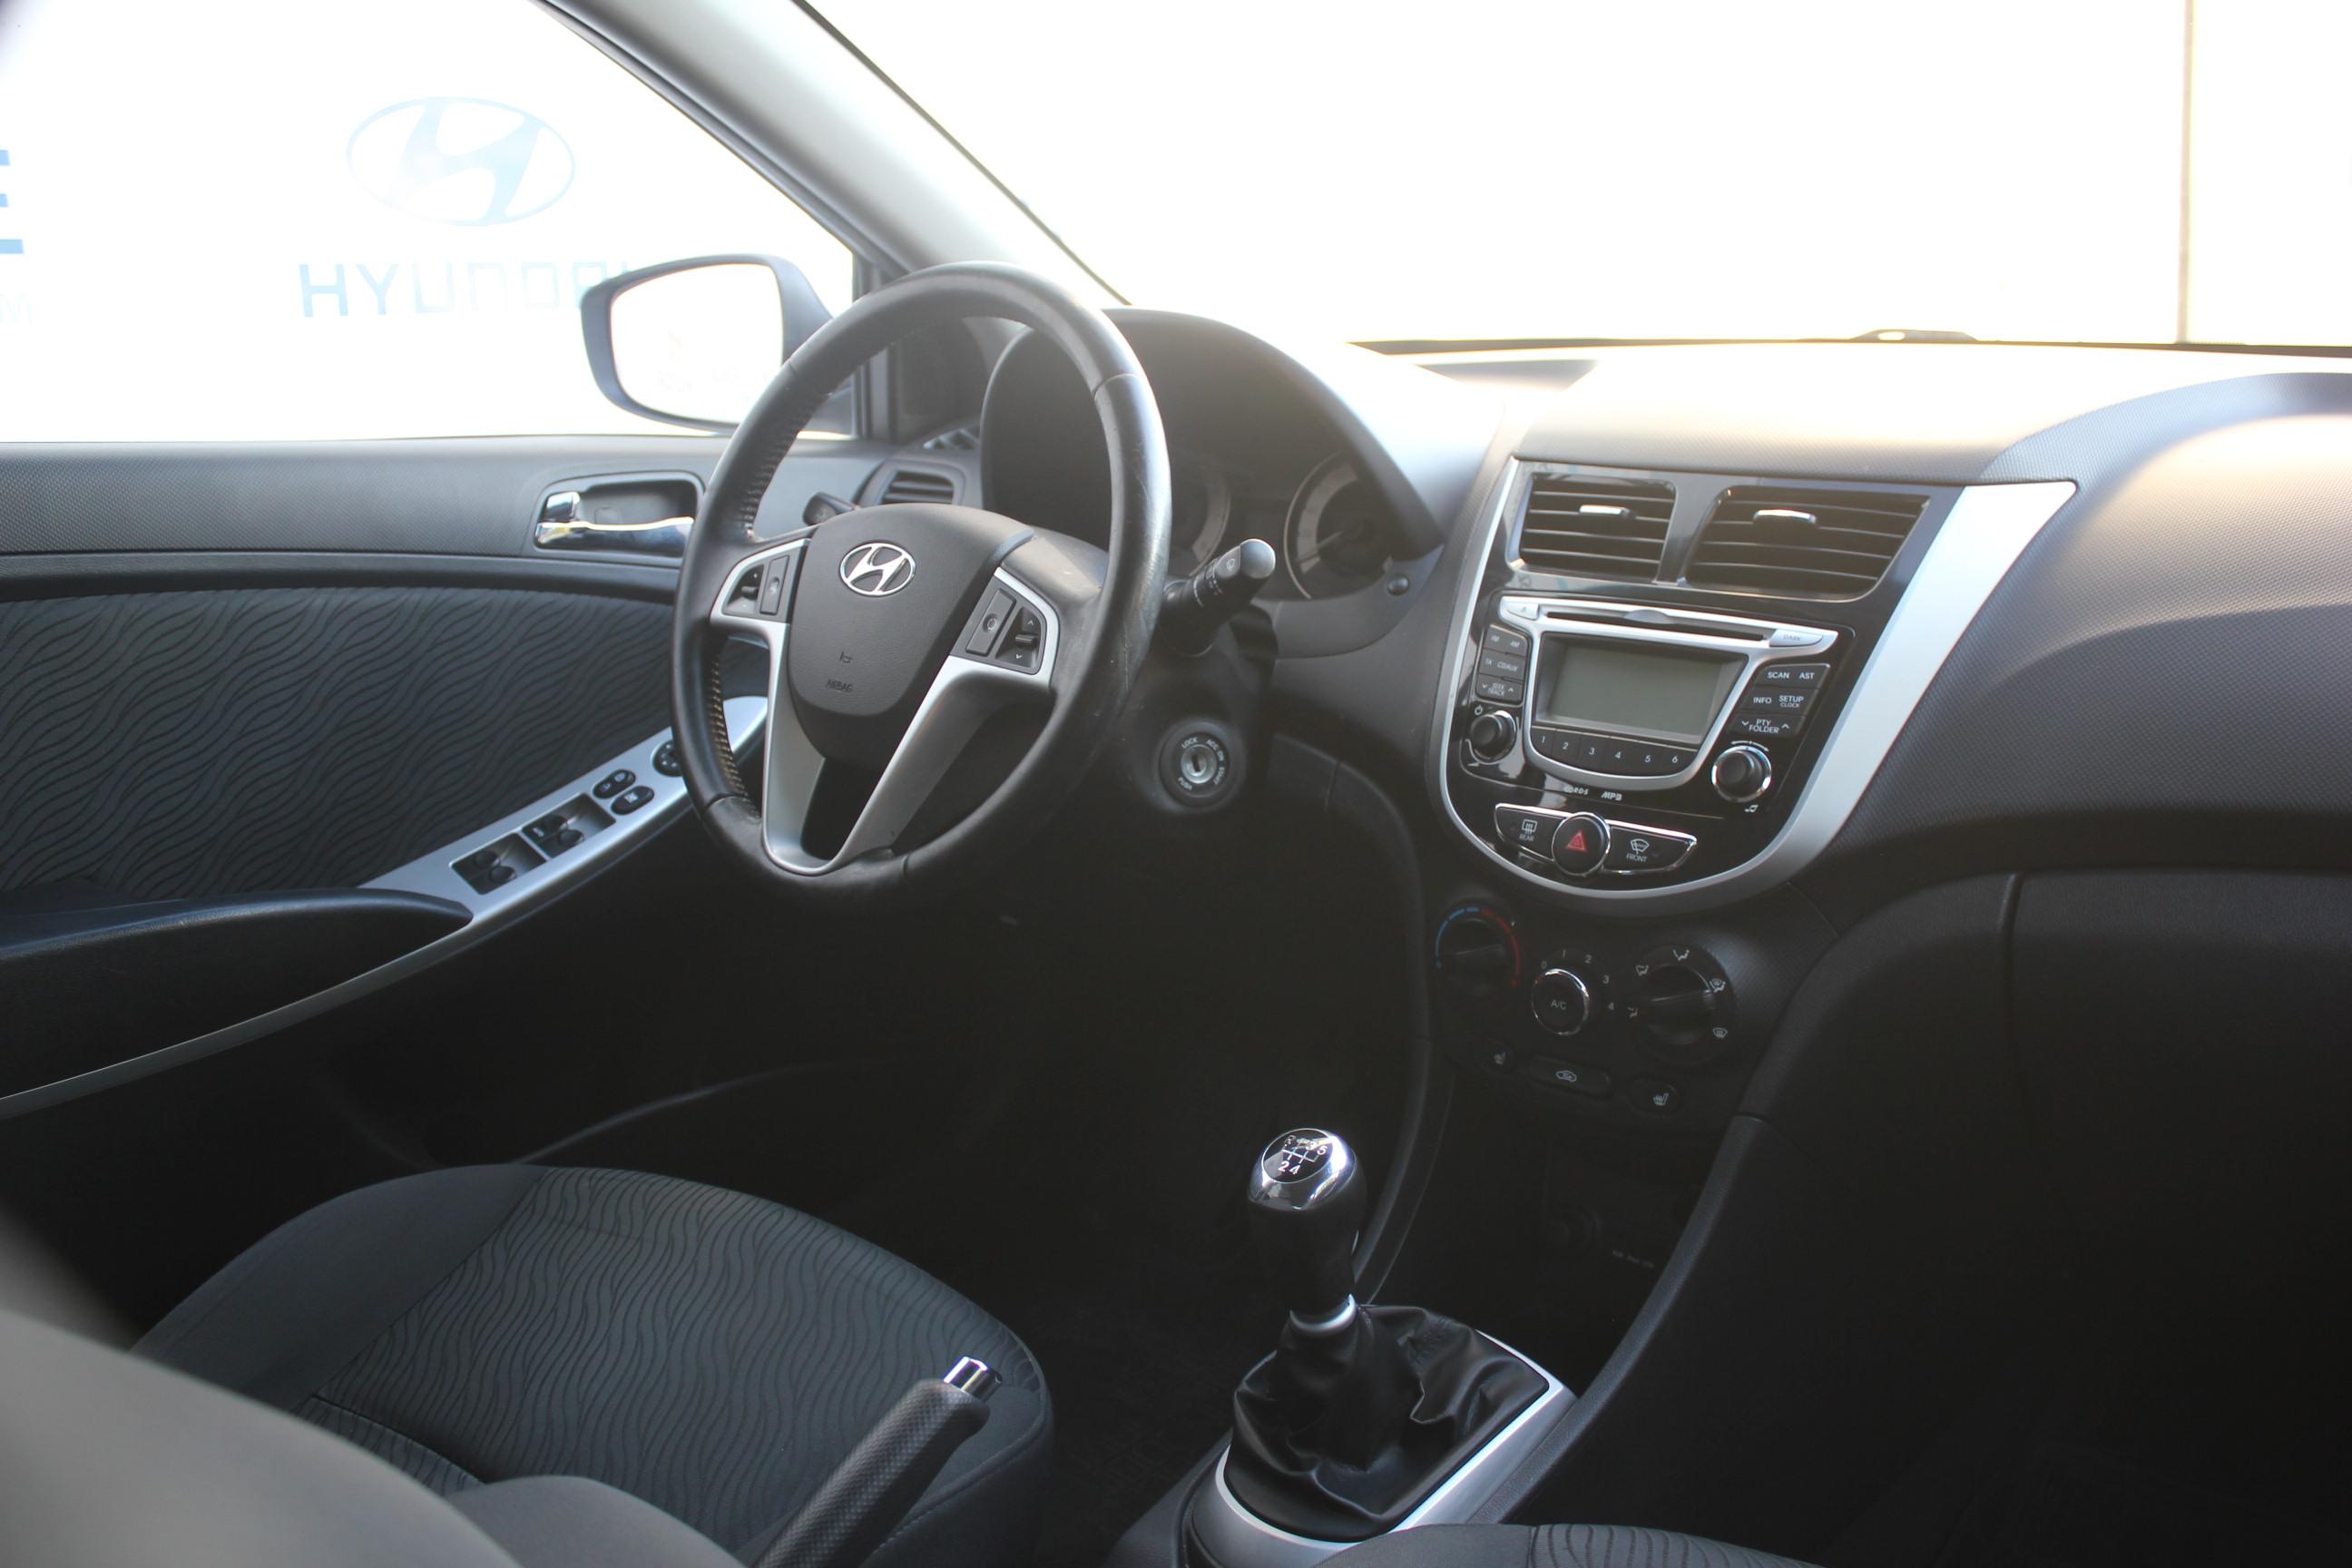 Hyundai Solaris Седан (2011г.)